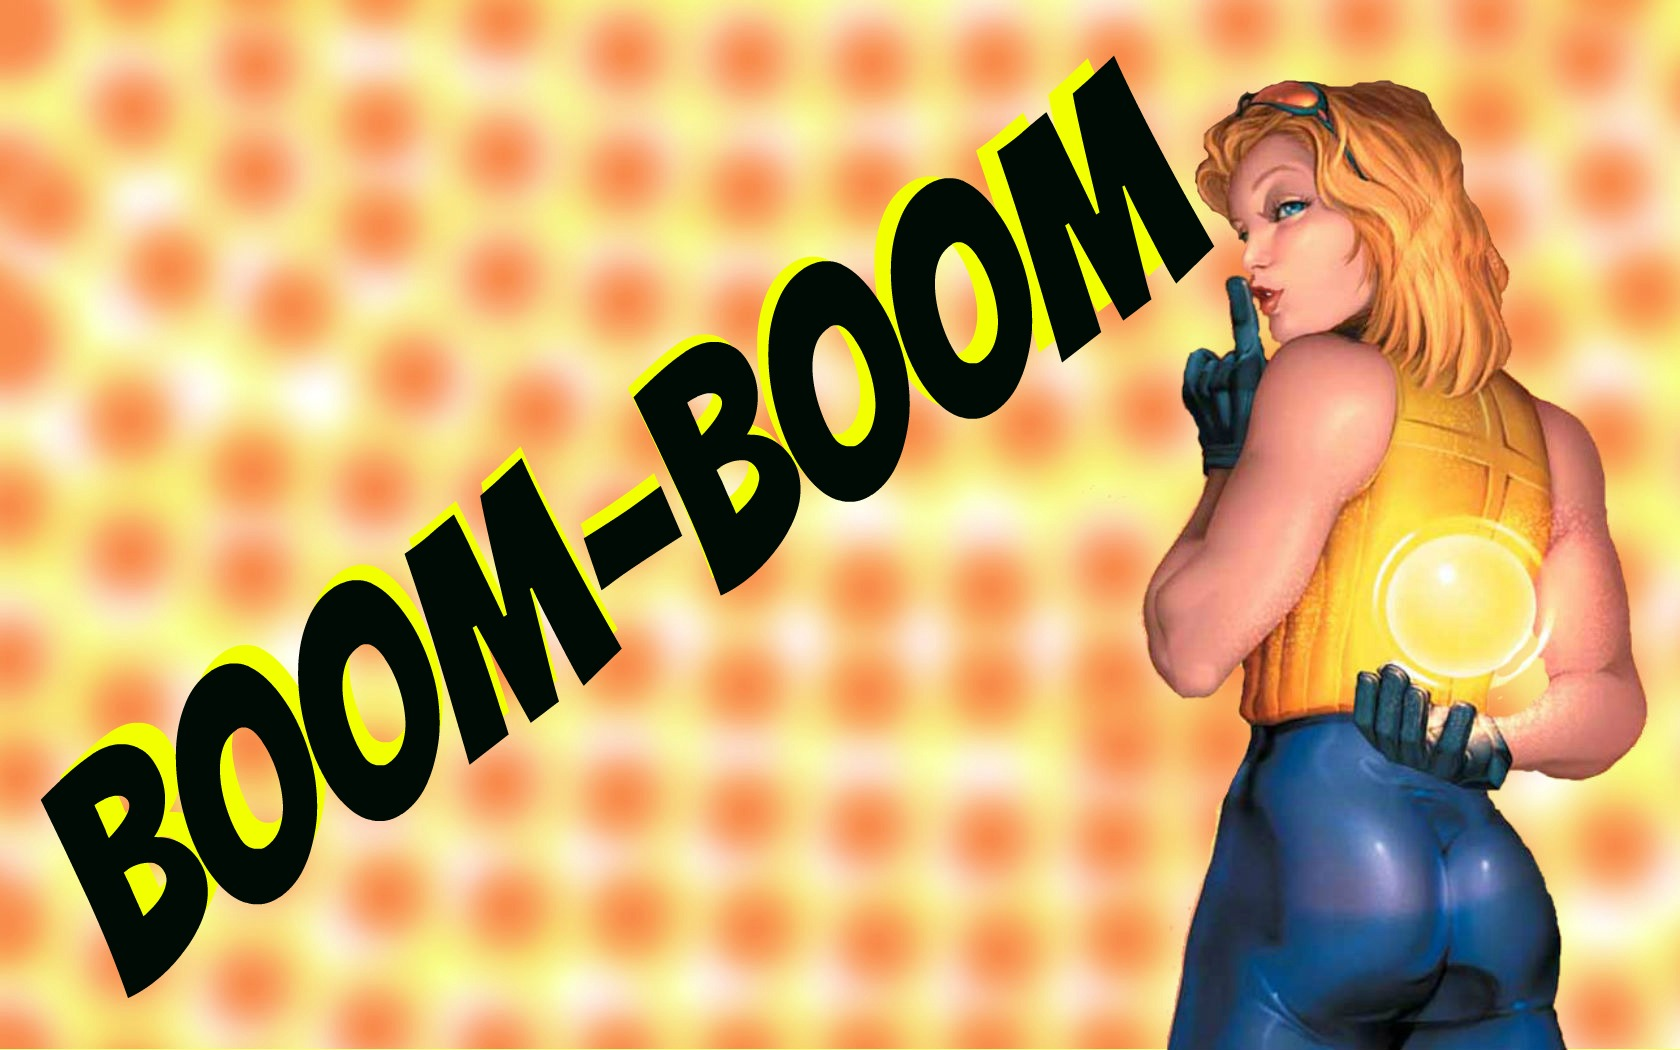 x men boom boom - photo #6